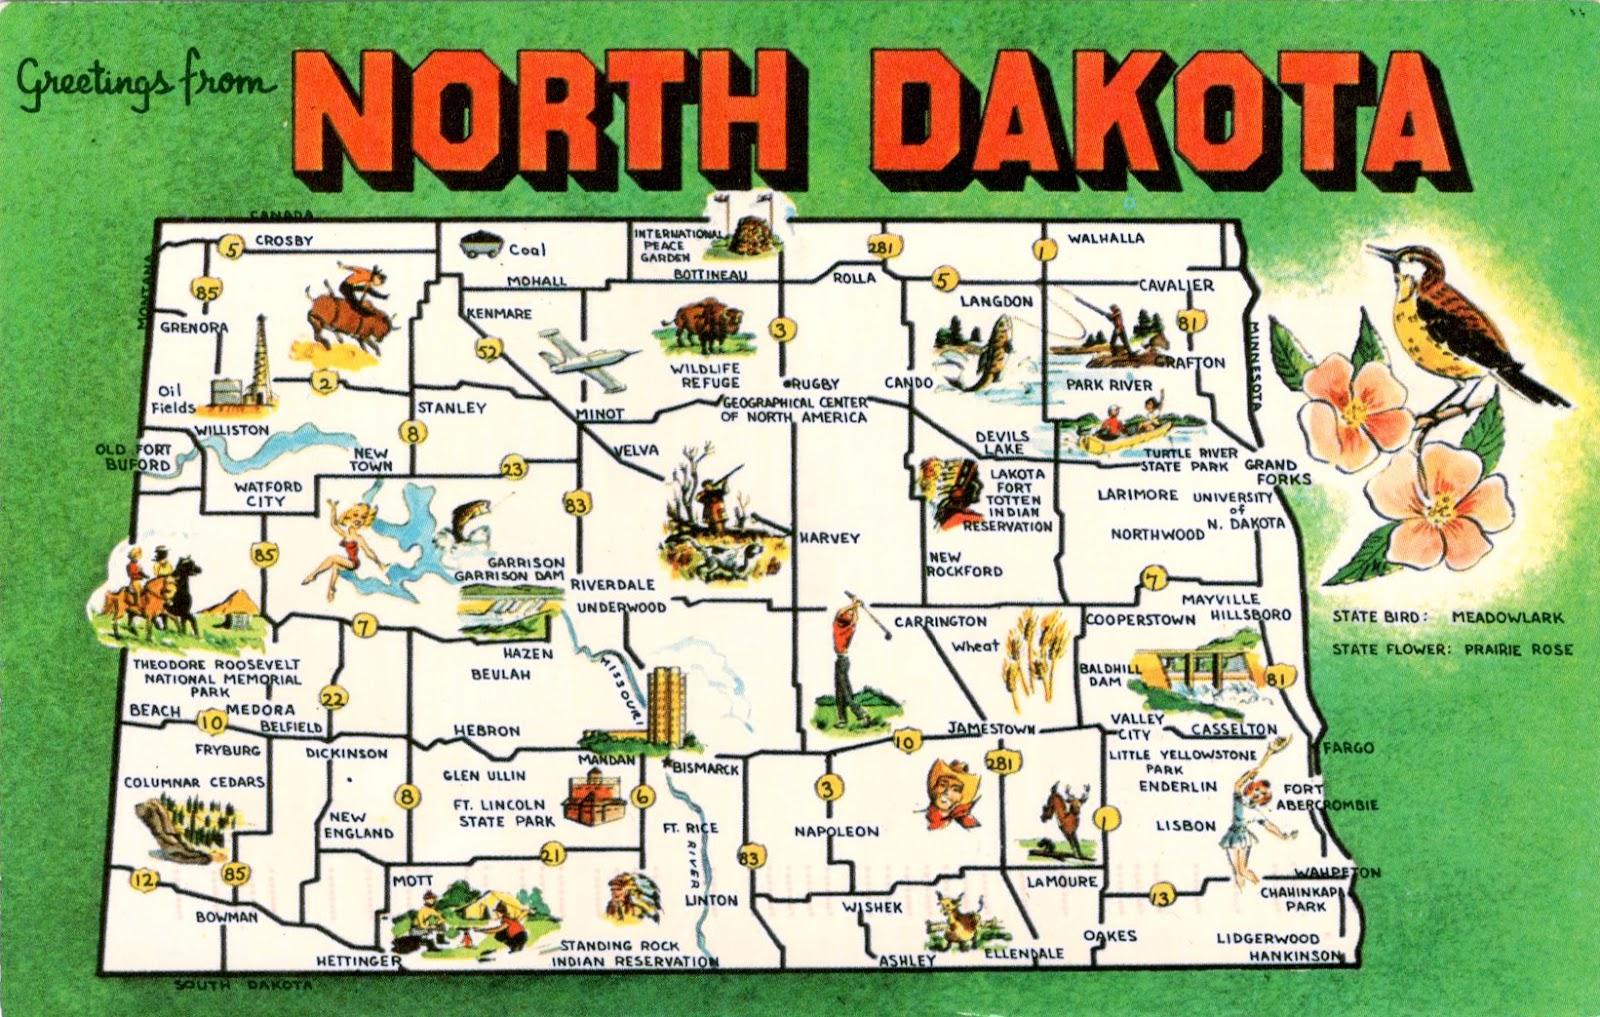 WORLD COME TO MY HOME 2243 UNITED STATES North Dakota North